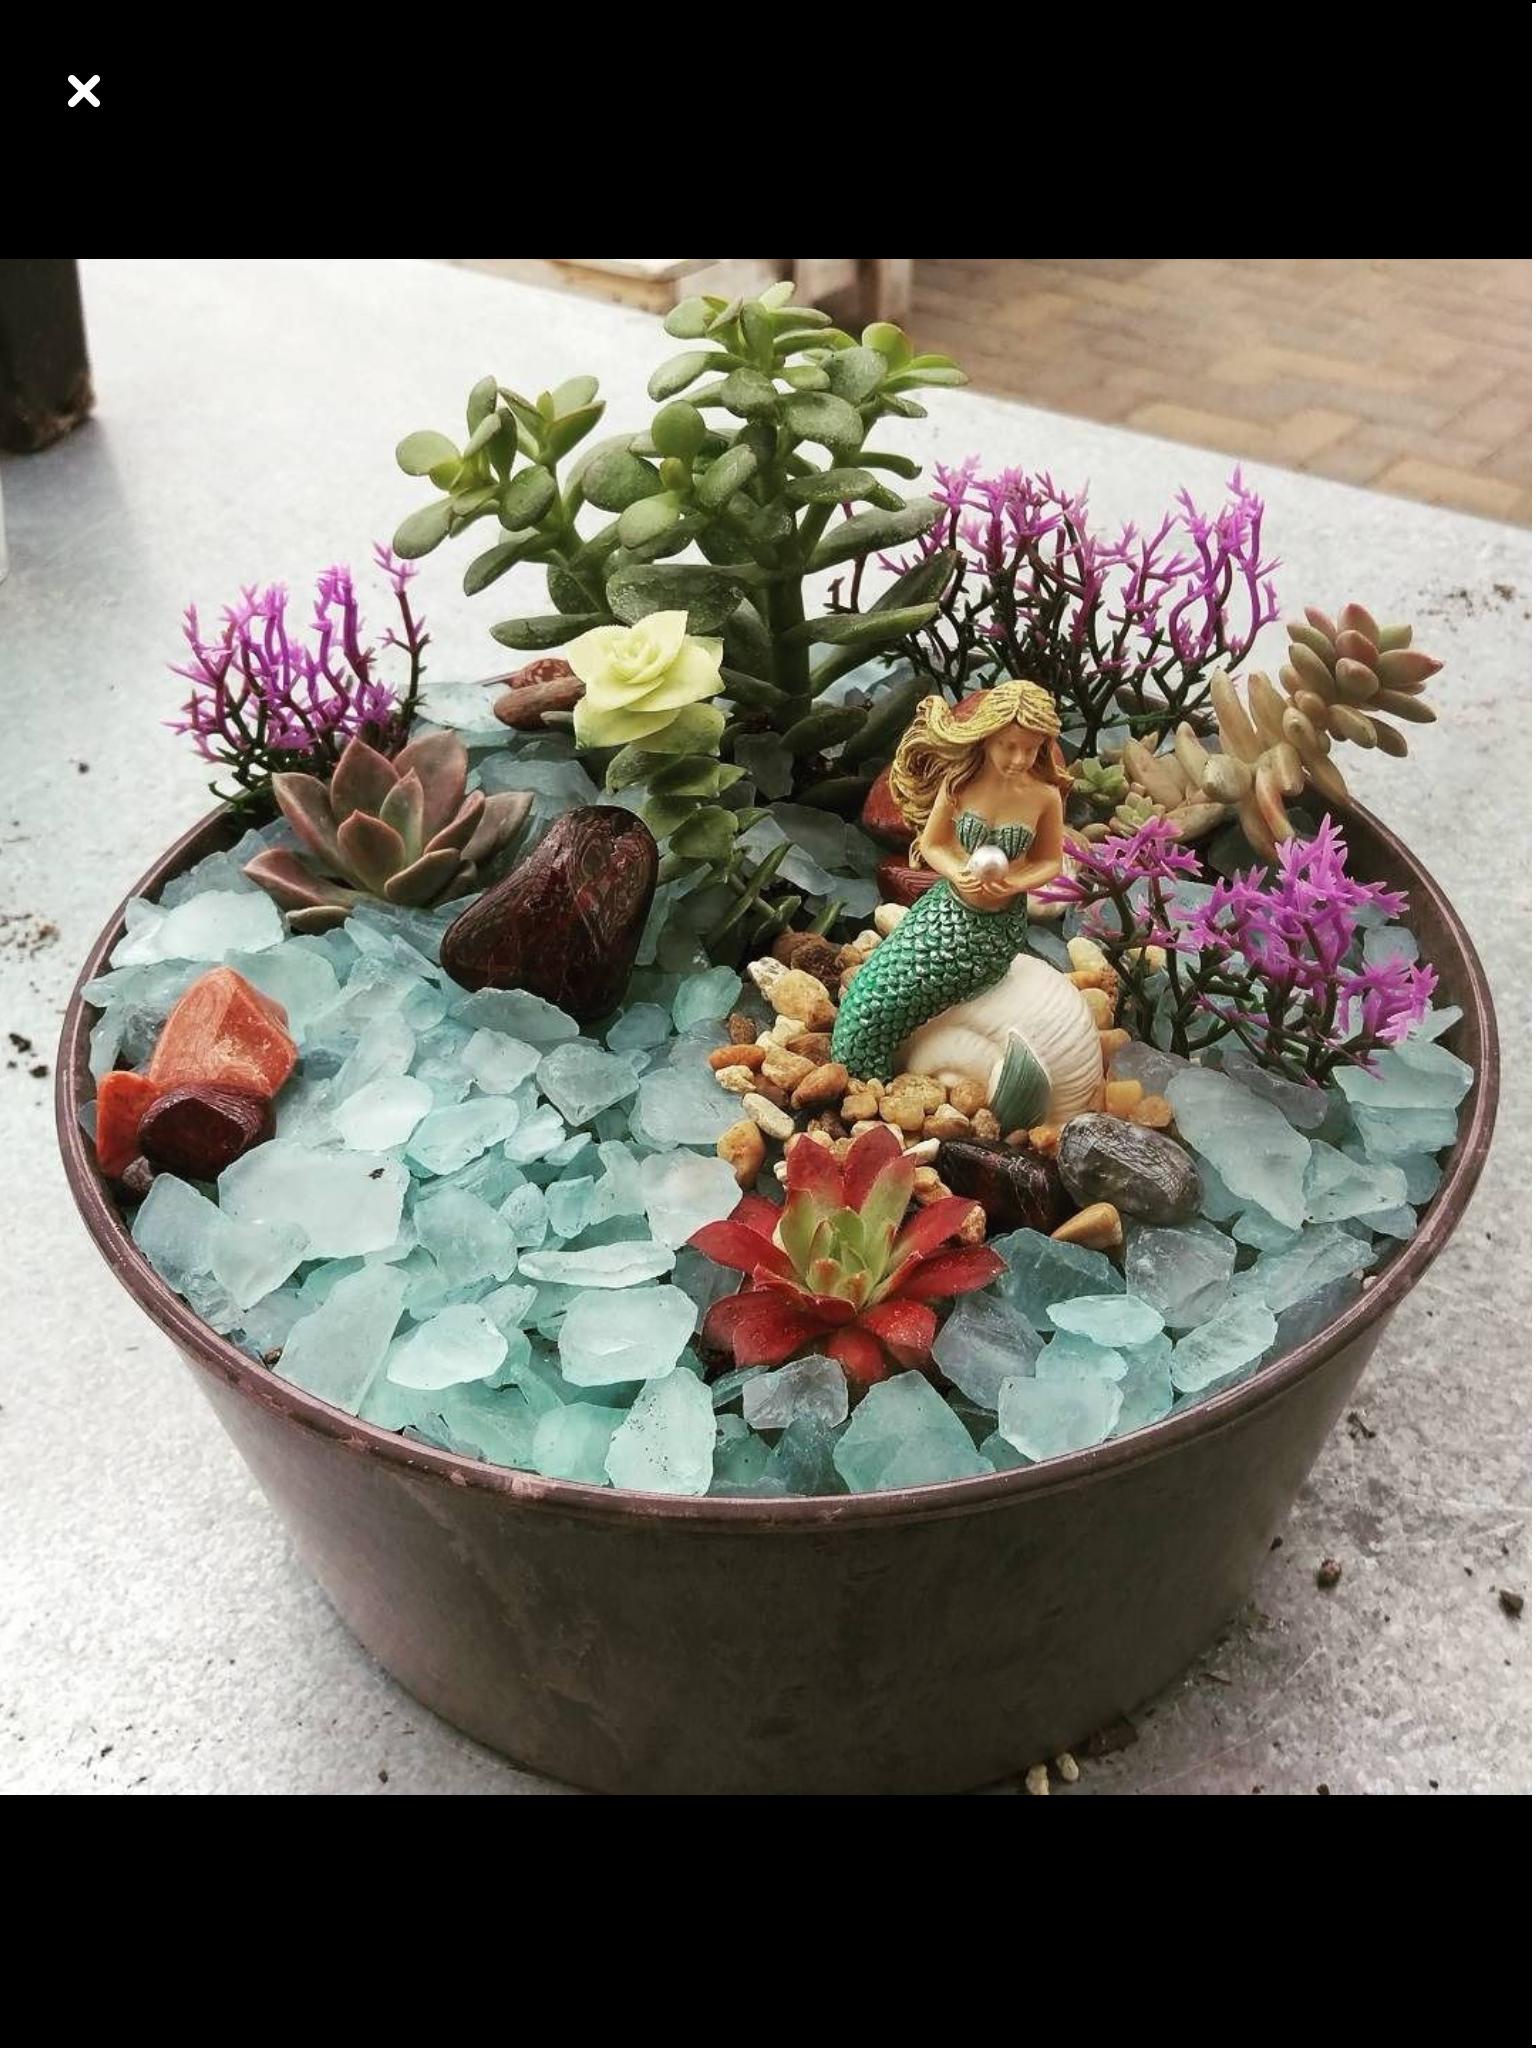 Pin By Ali Patterson On Garden Stuff Miniature Fairy Gardens